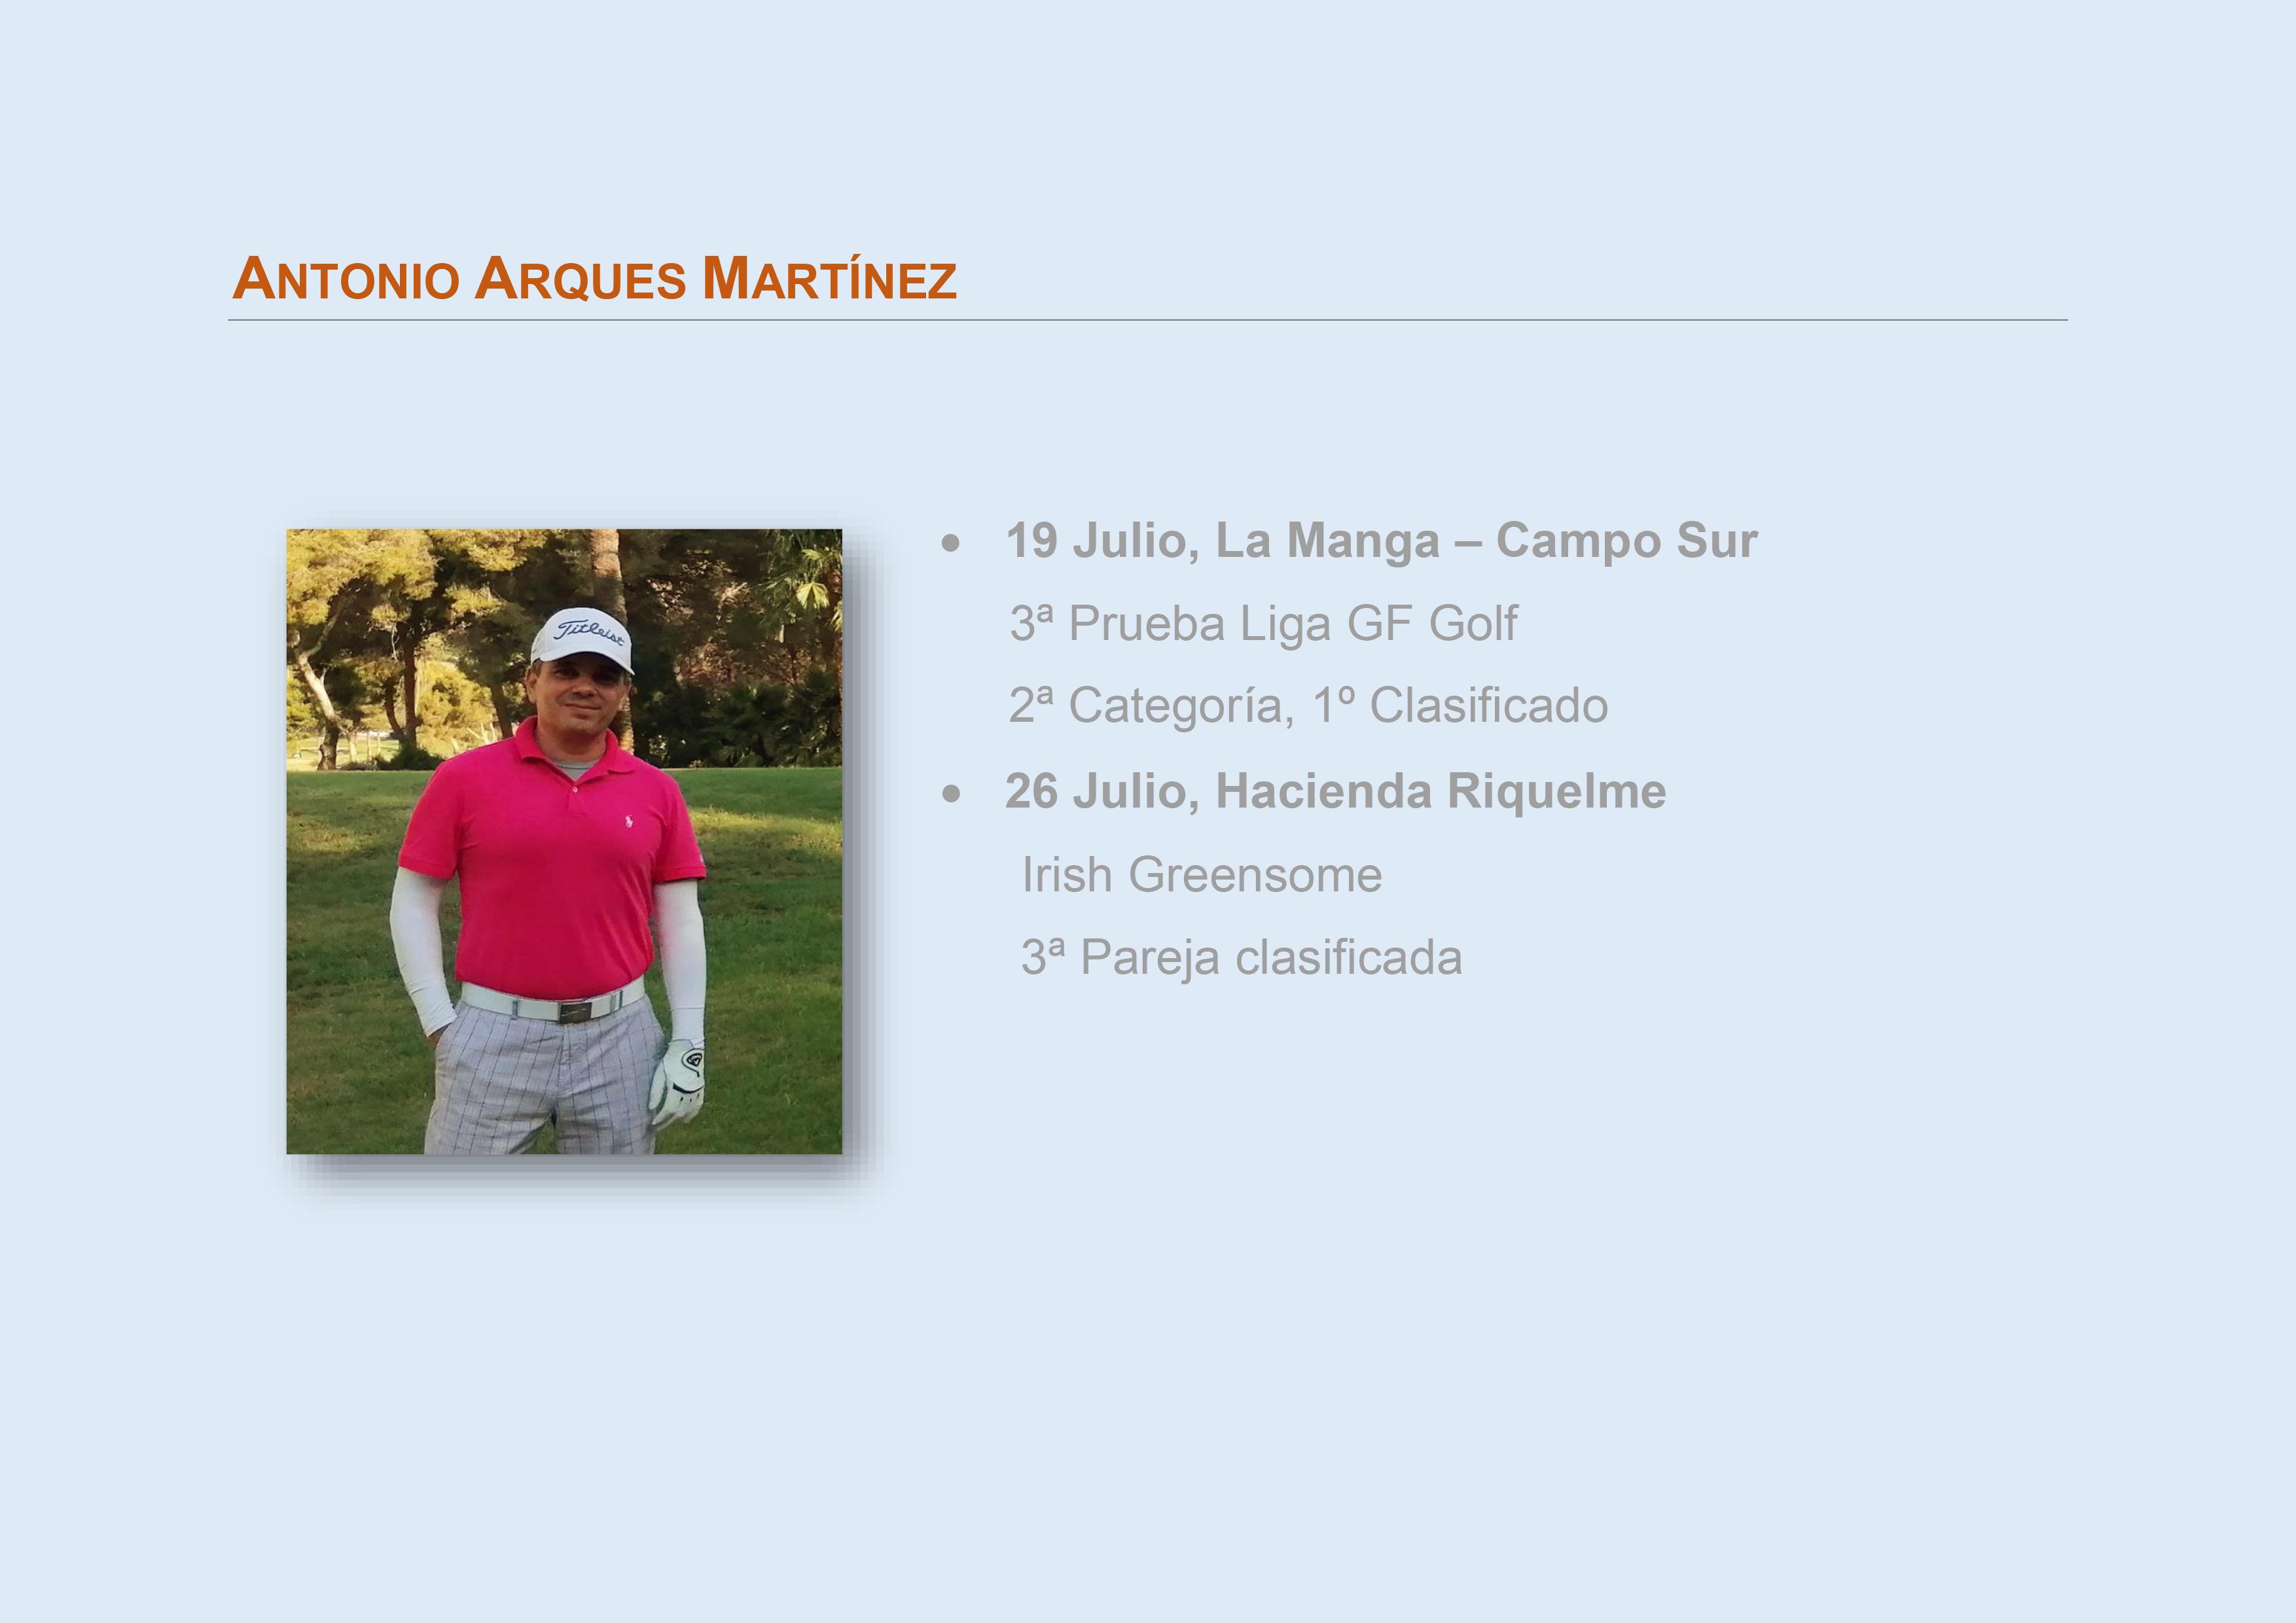 Arques Martinez, Antonio